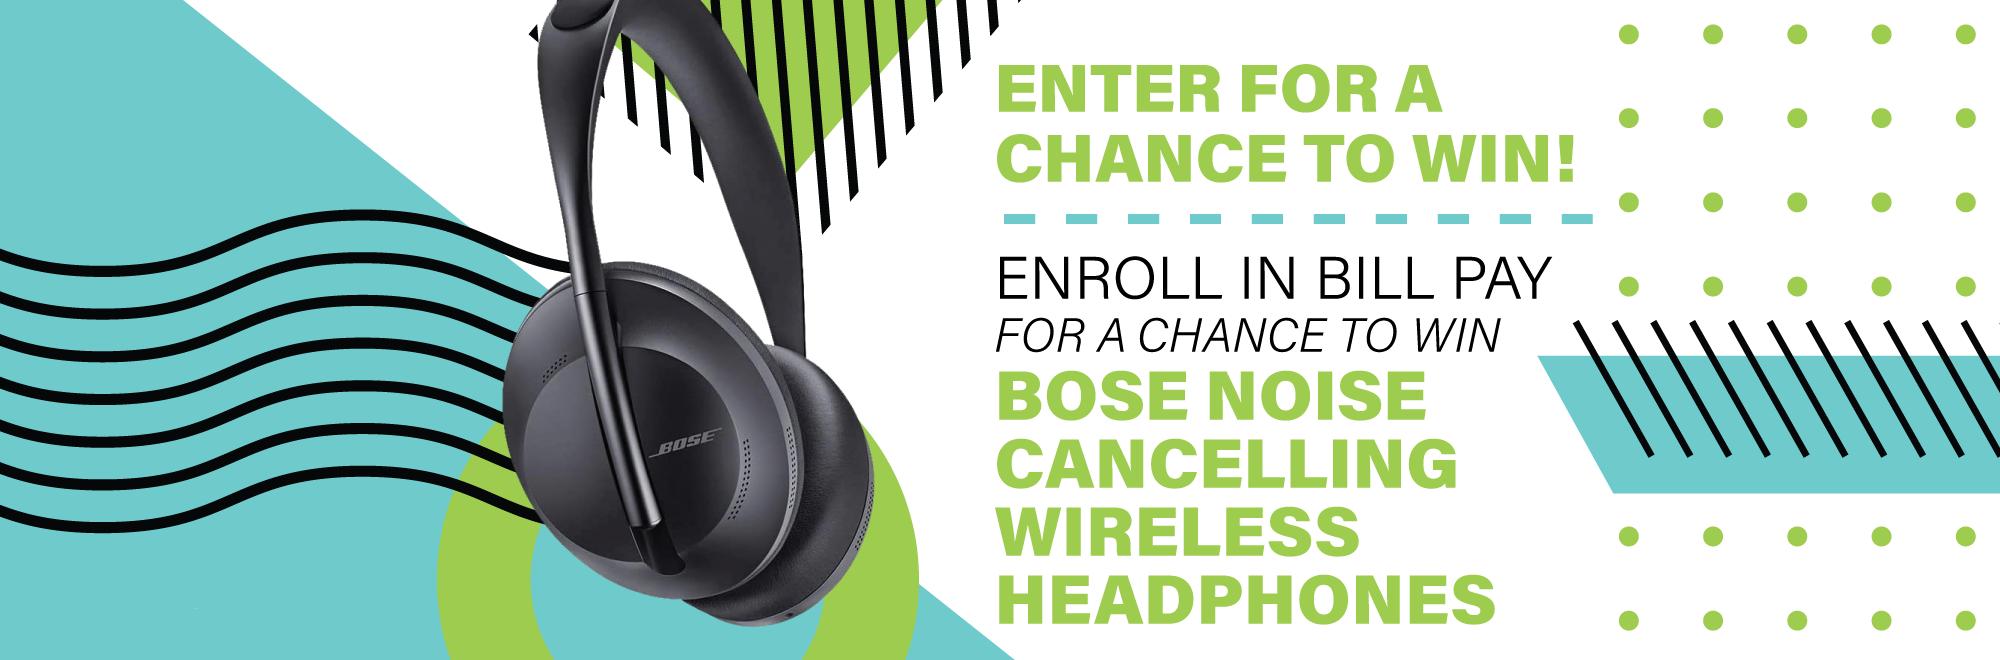 Win Bose Headphones Contest